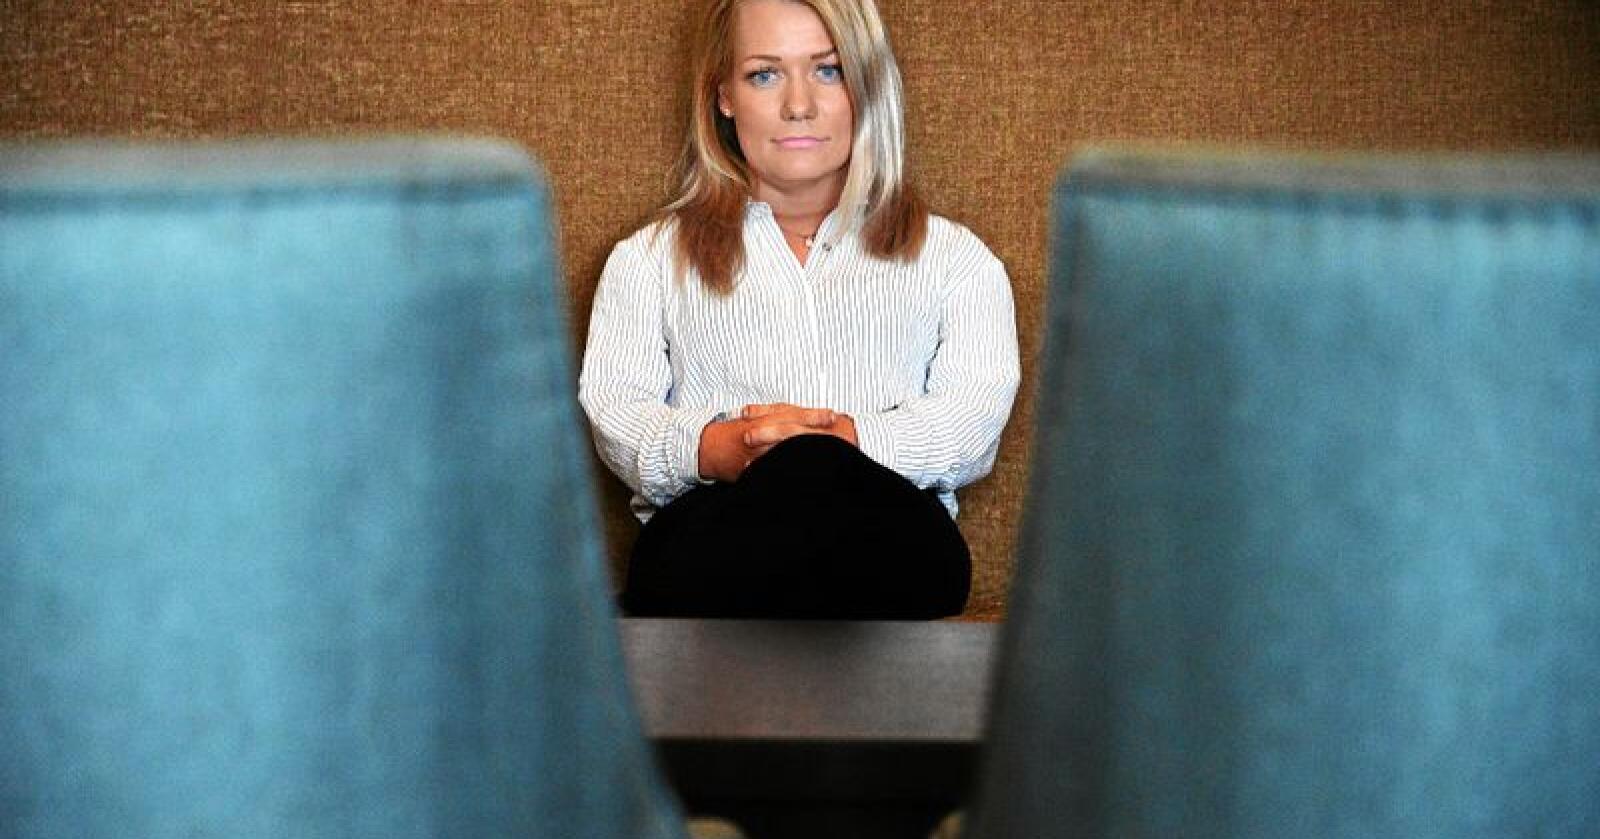 Stortingsrepresentant Sandra Borch (Sp). Foto: Siri Juell Rasmussen